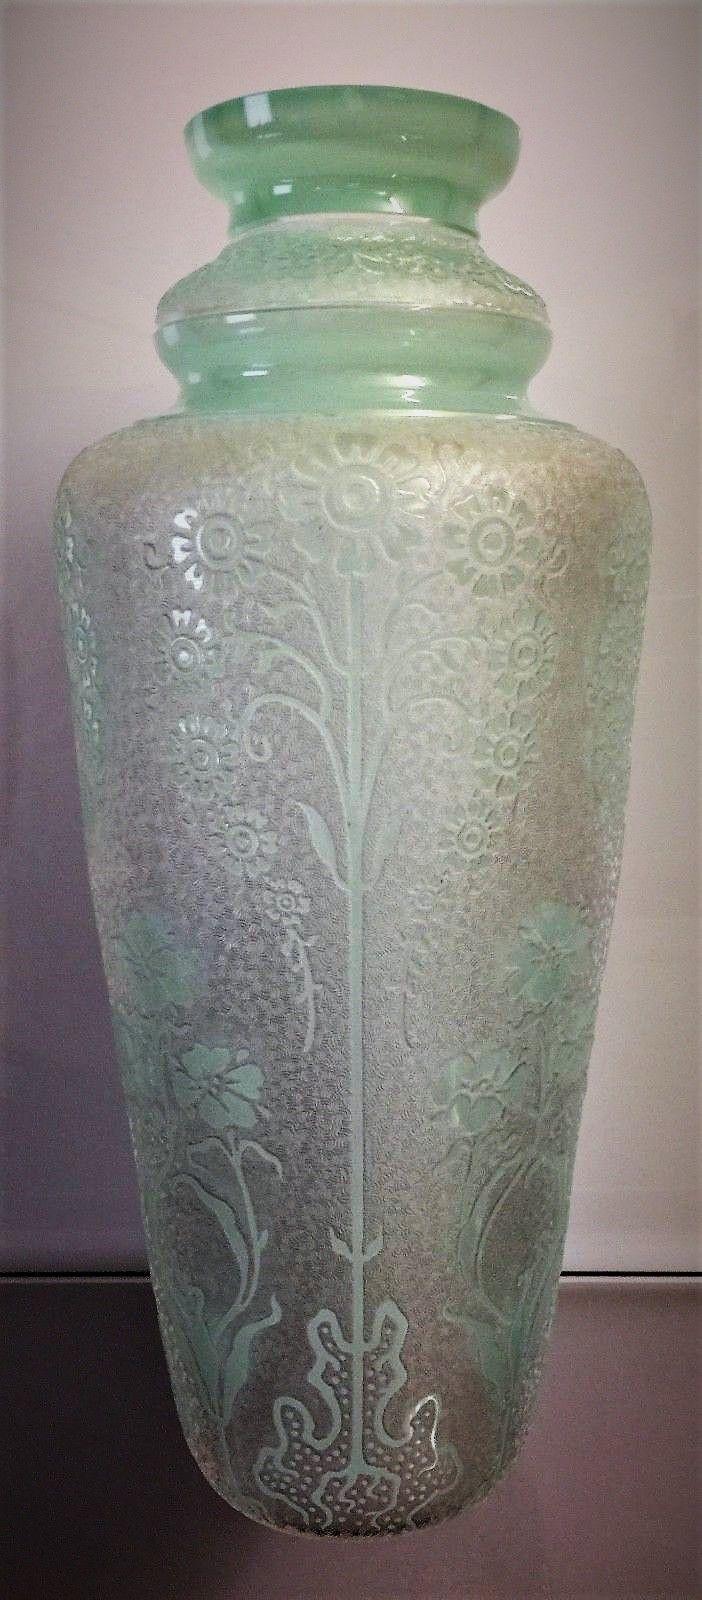 1286 best crystalglass vases images on pinterest glass vase val saint lambert vase en cristal vert deau souffl et travaill floridaeventfo Image collections